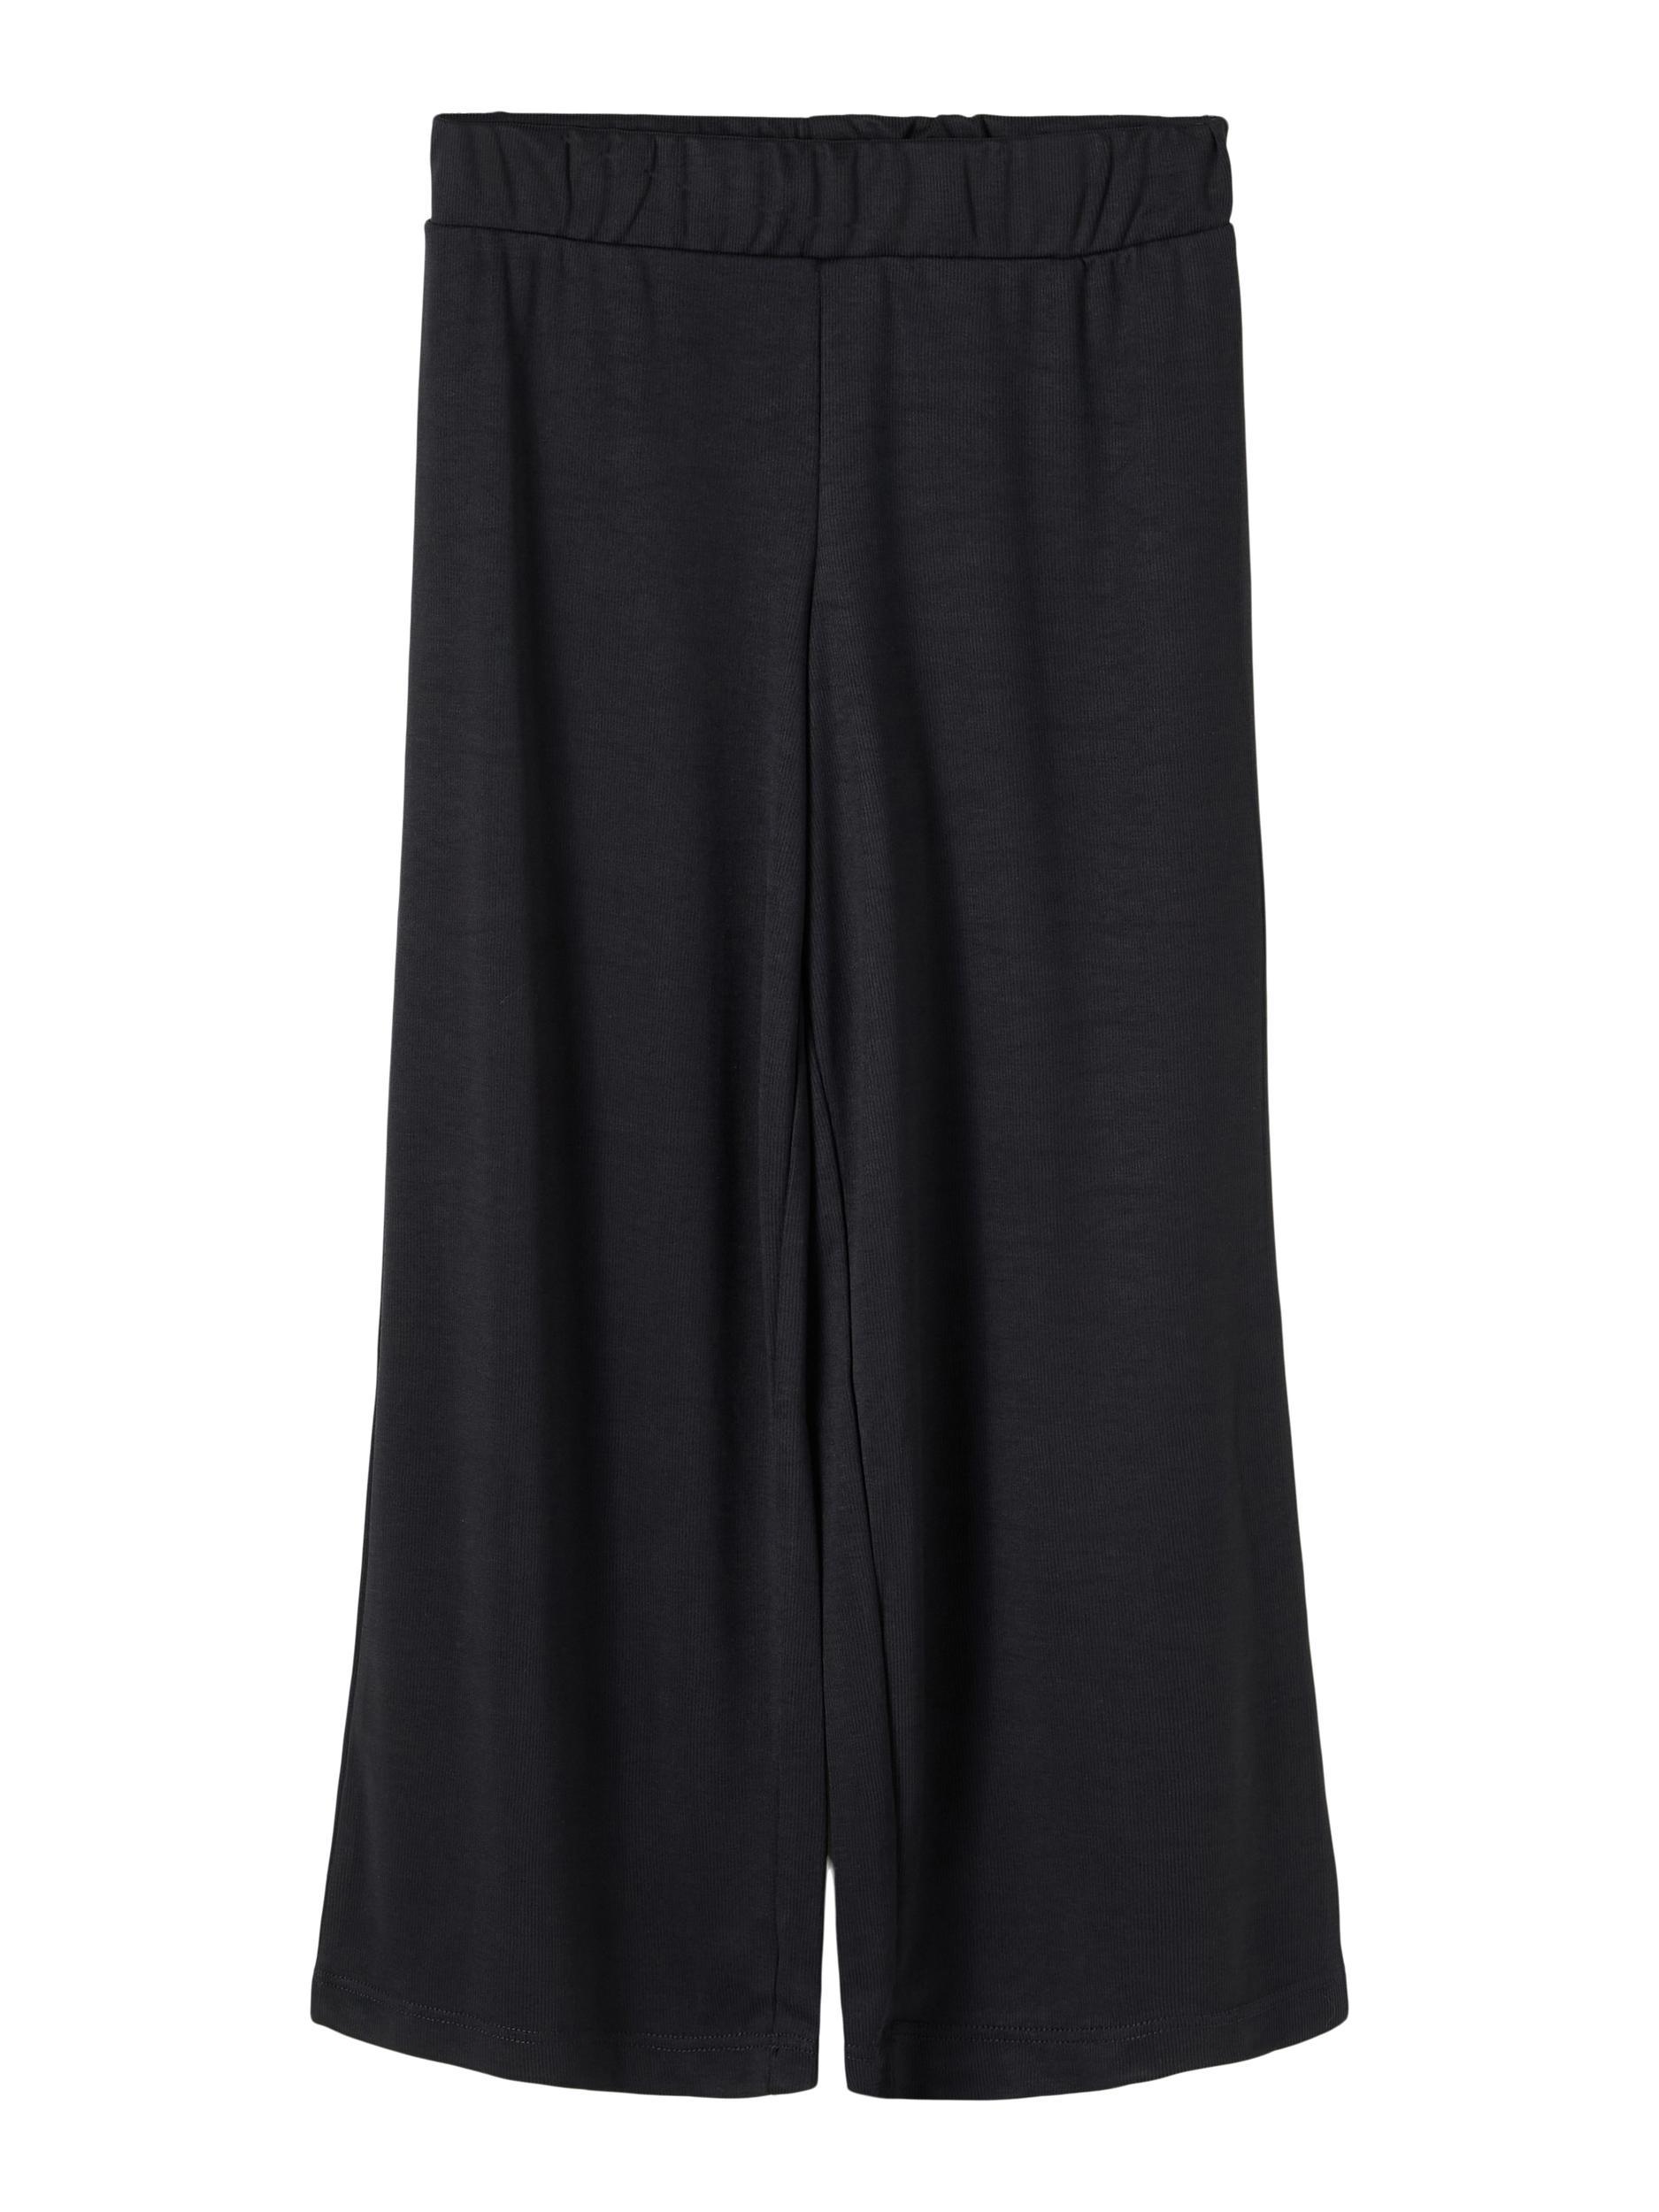 Name It Bansia wide pants, black, 116